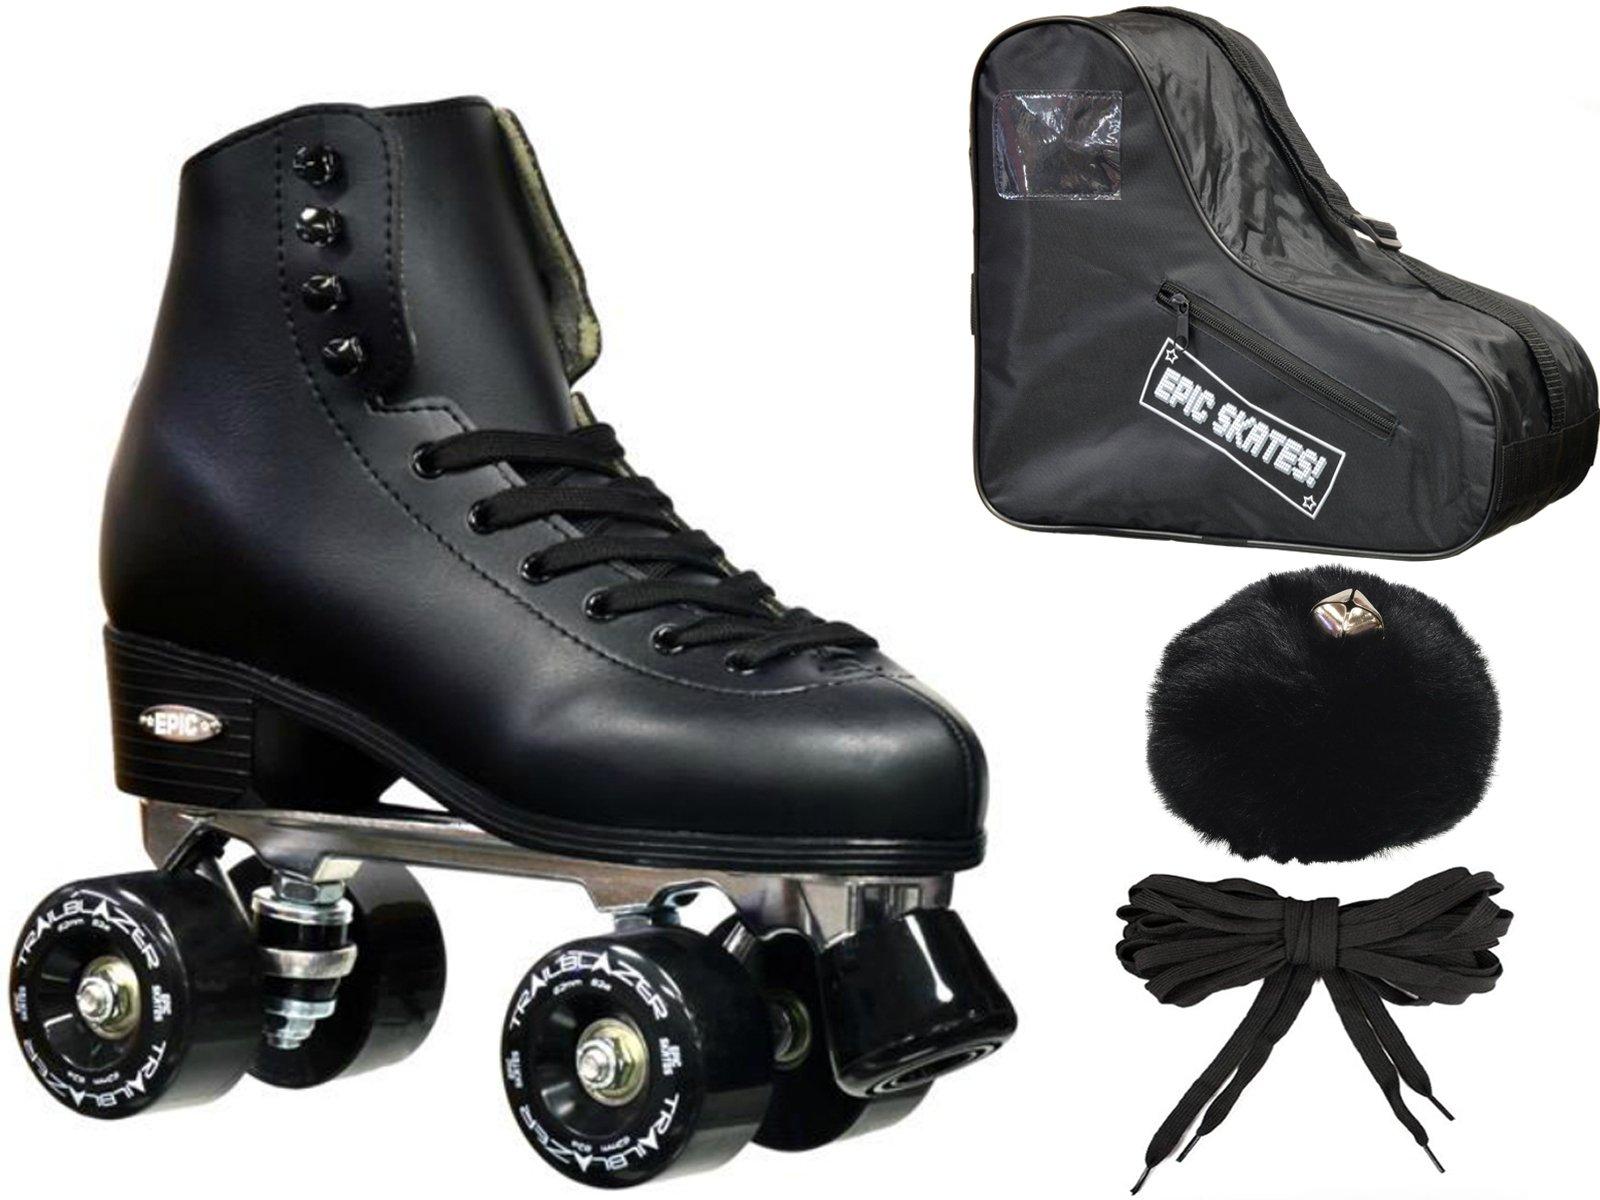 New! Epic Classic Solid Black High-Top Quad Roller Skate Bundle w/ Bag, Laces, & Pom Poms! (Mens 11)